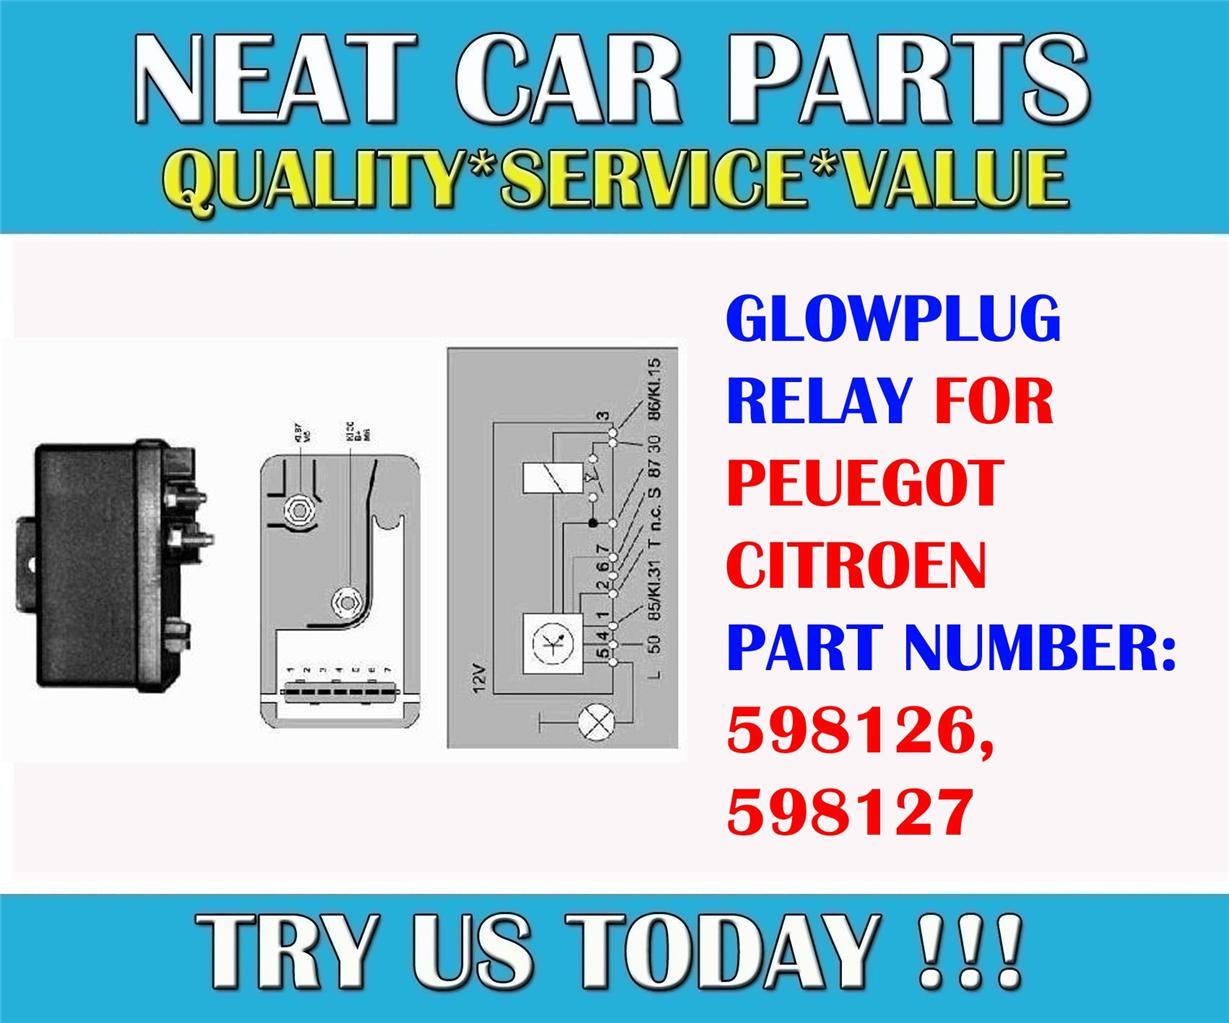 glow plug relay for peugeot 106 205 306 405 expert boxer ... peugeot 306 glow plug relay wiring diagram #9